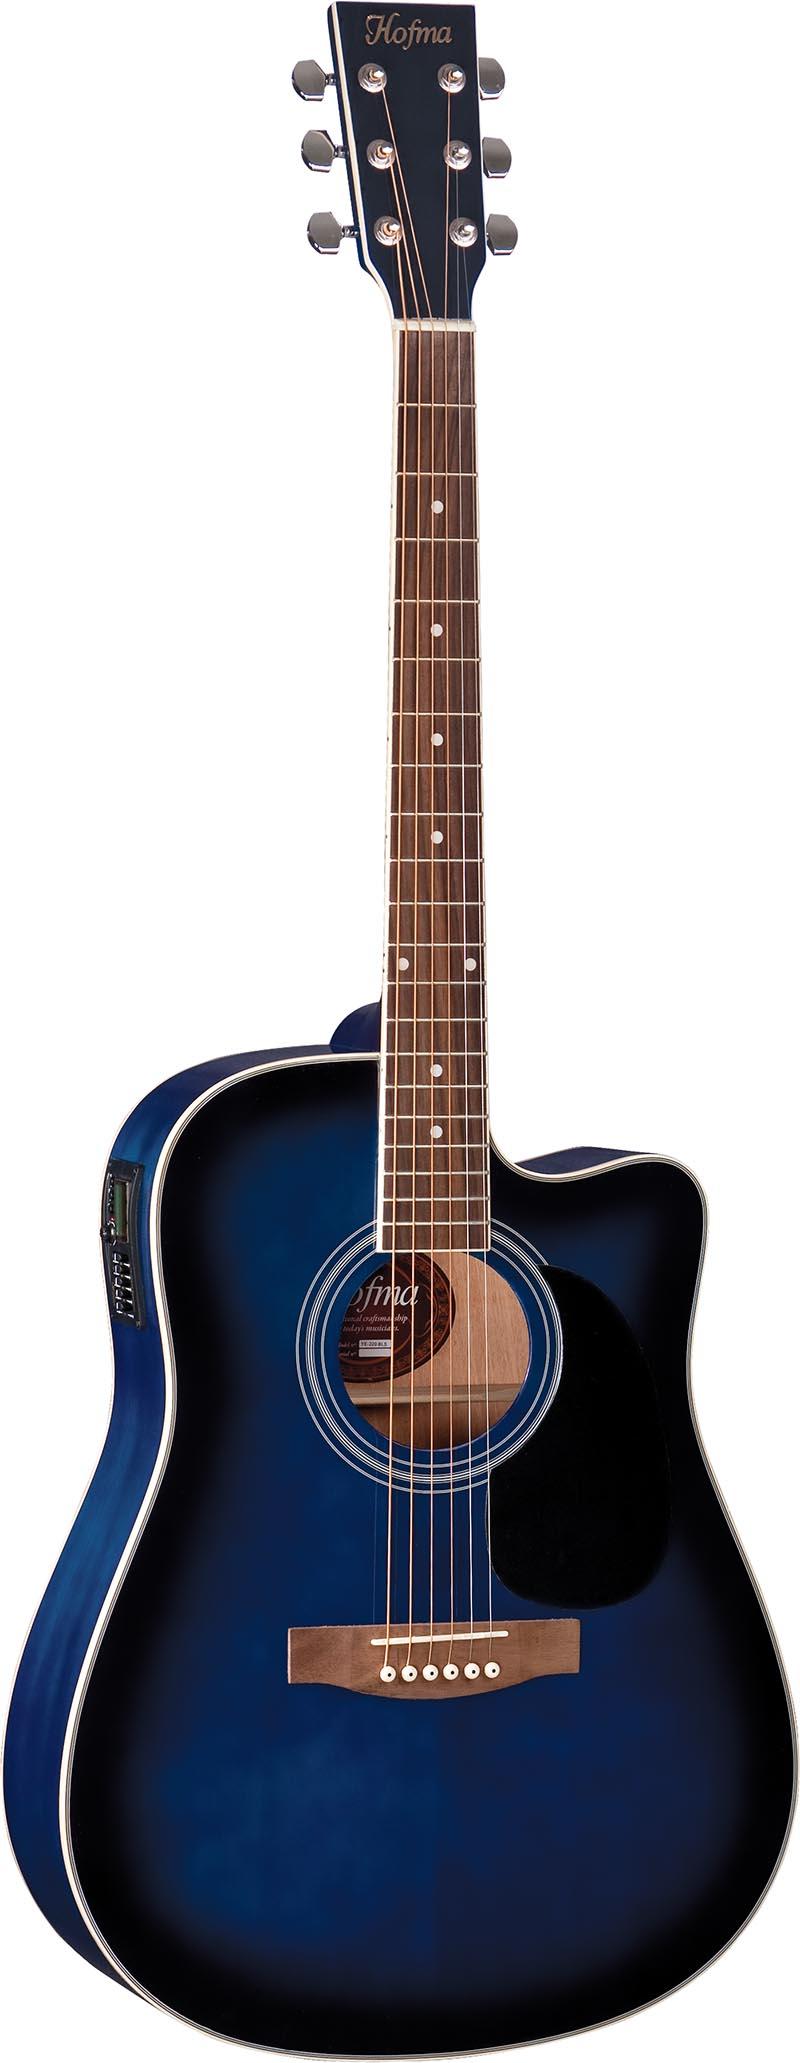 ye220 violao folk dreadnought eletroacustico hofma ye220 bls blue sunburst azul visao frontal vertical